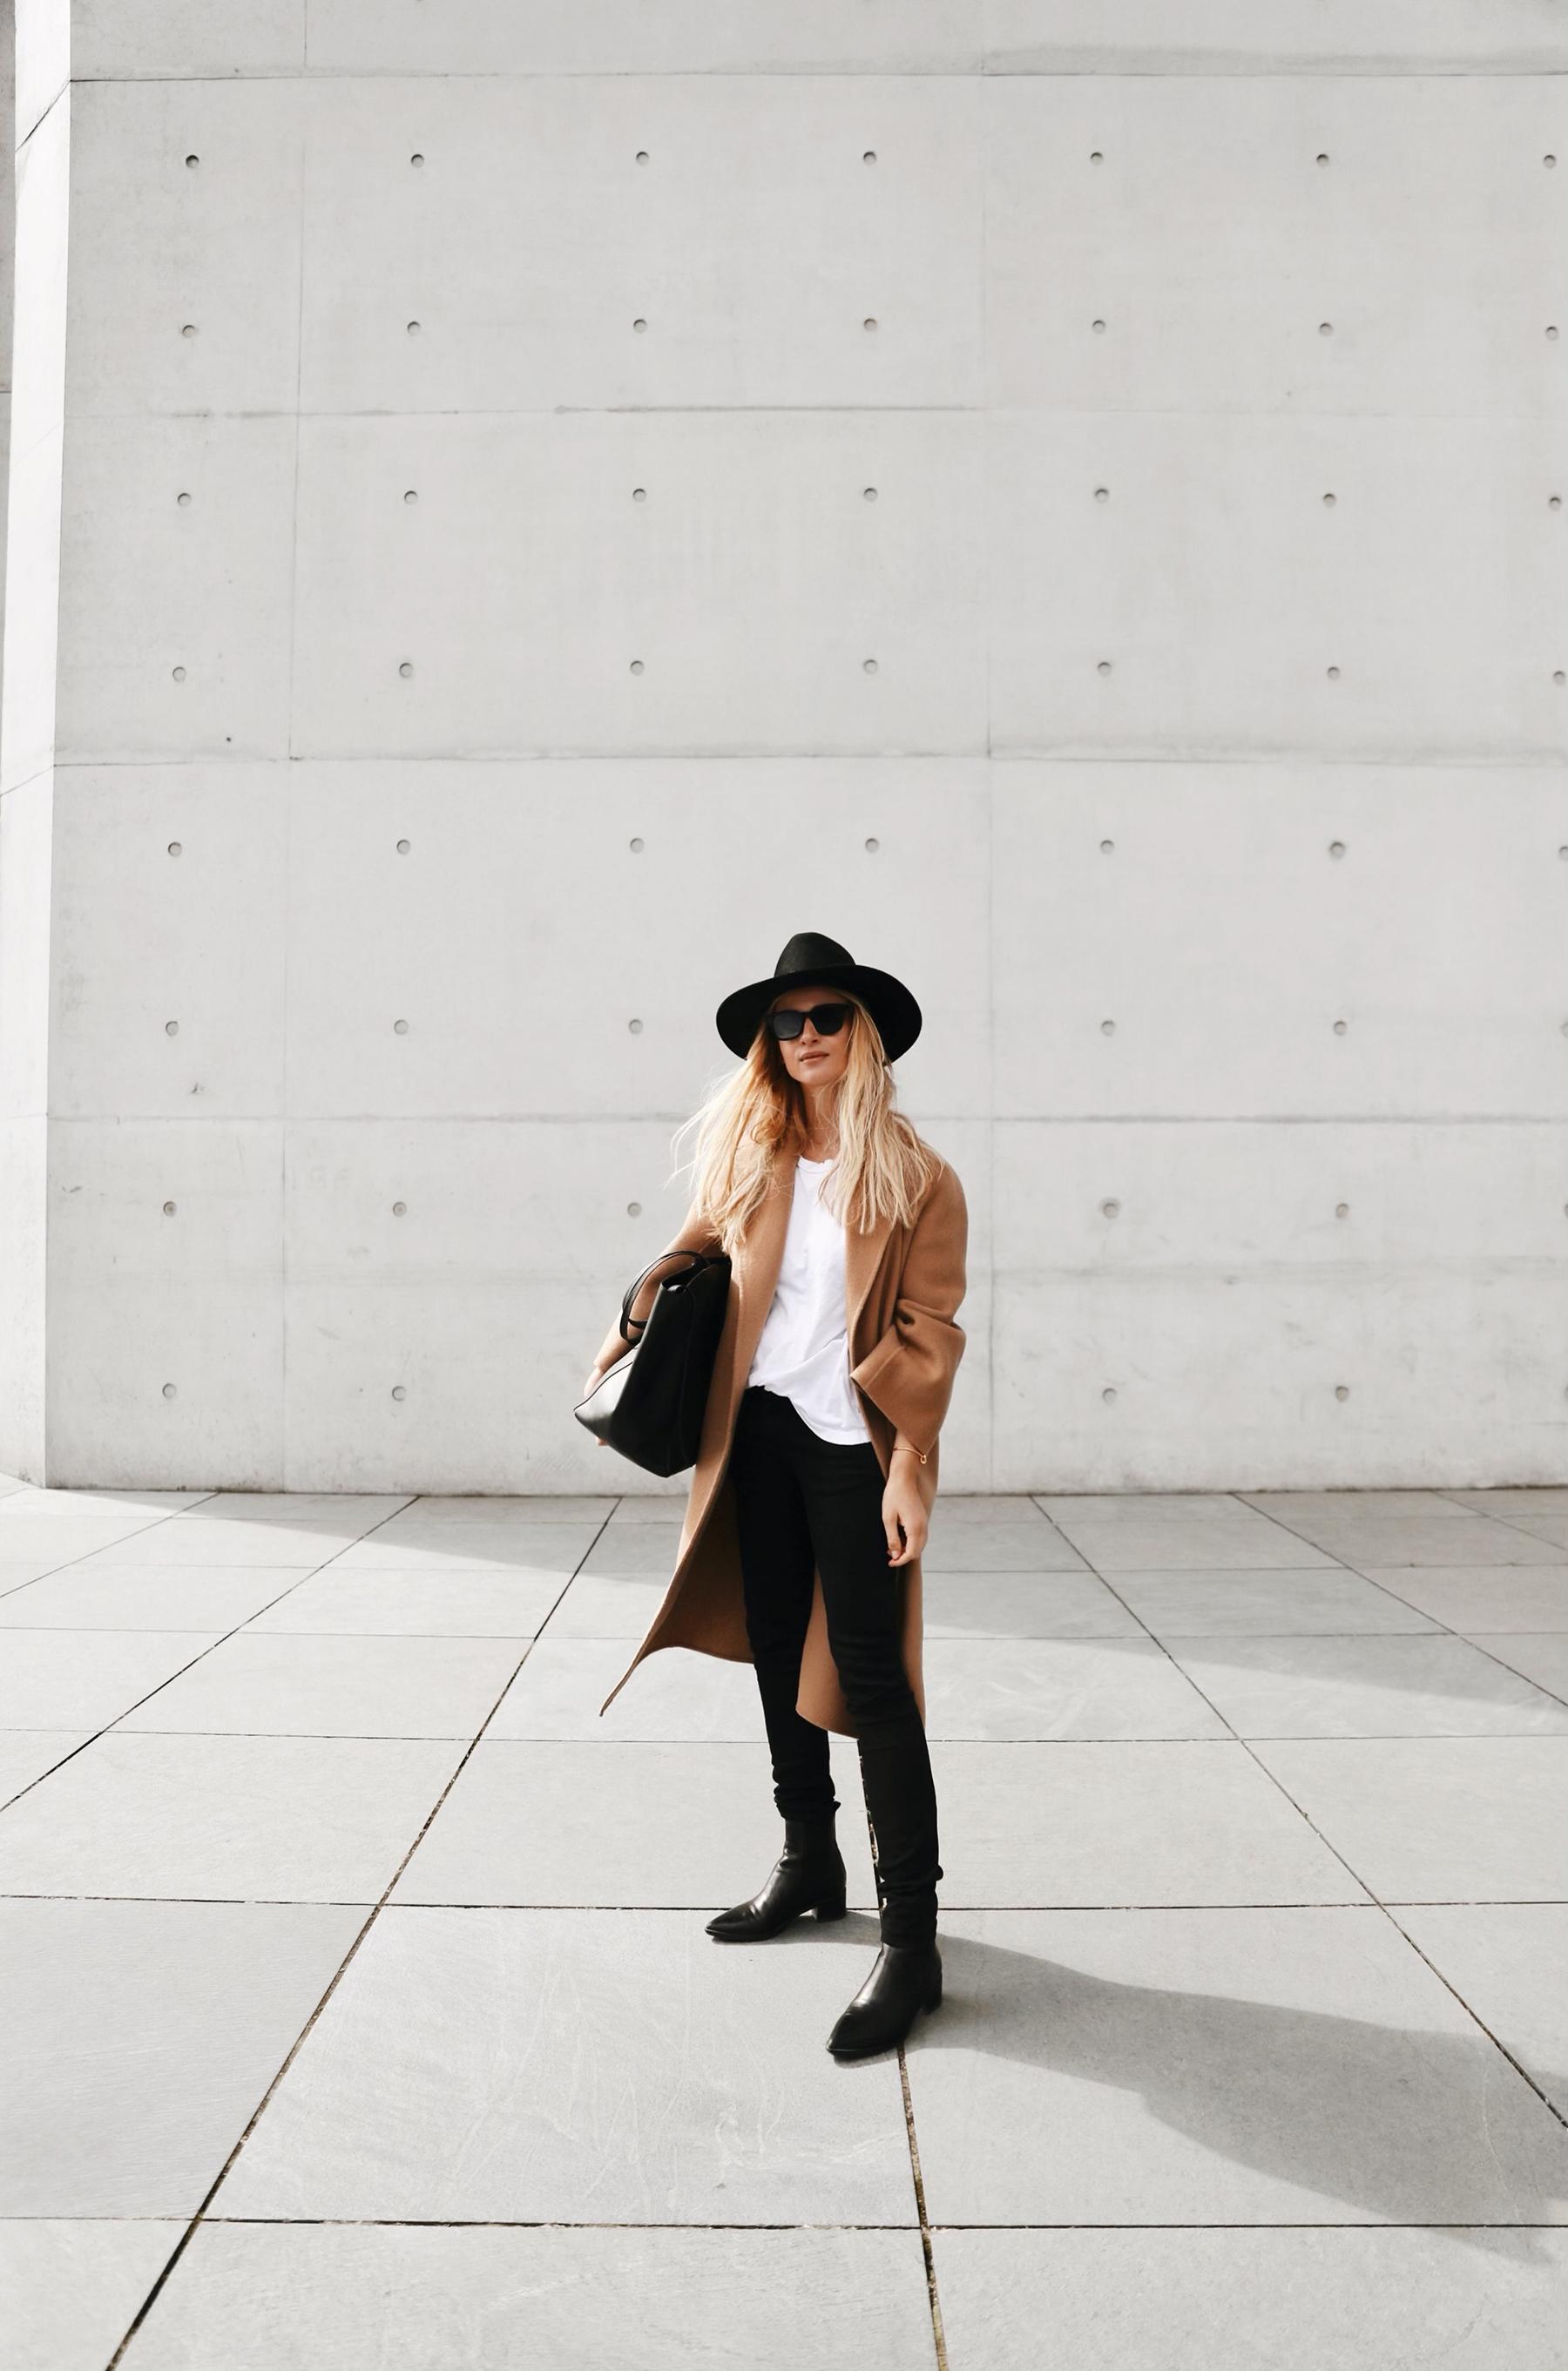 MIJA_CAMELCONCRETE_7